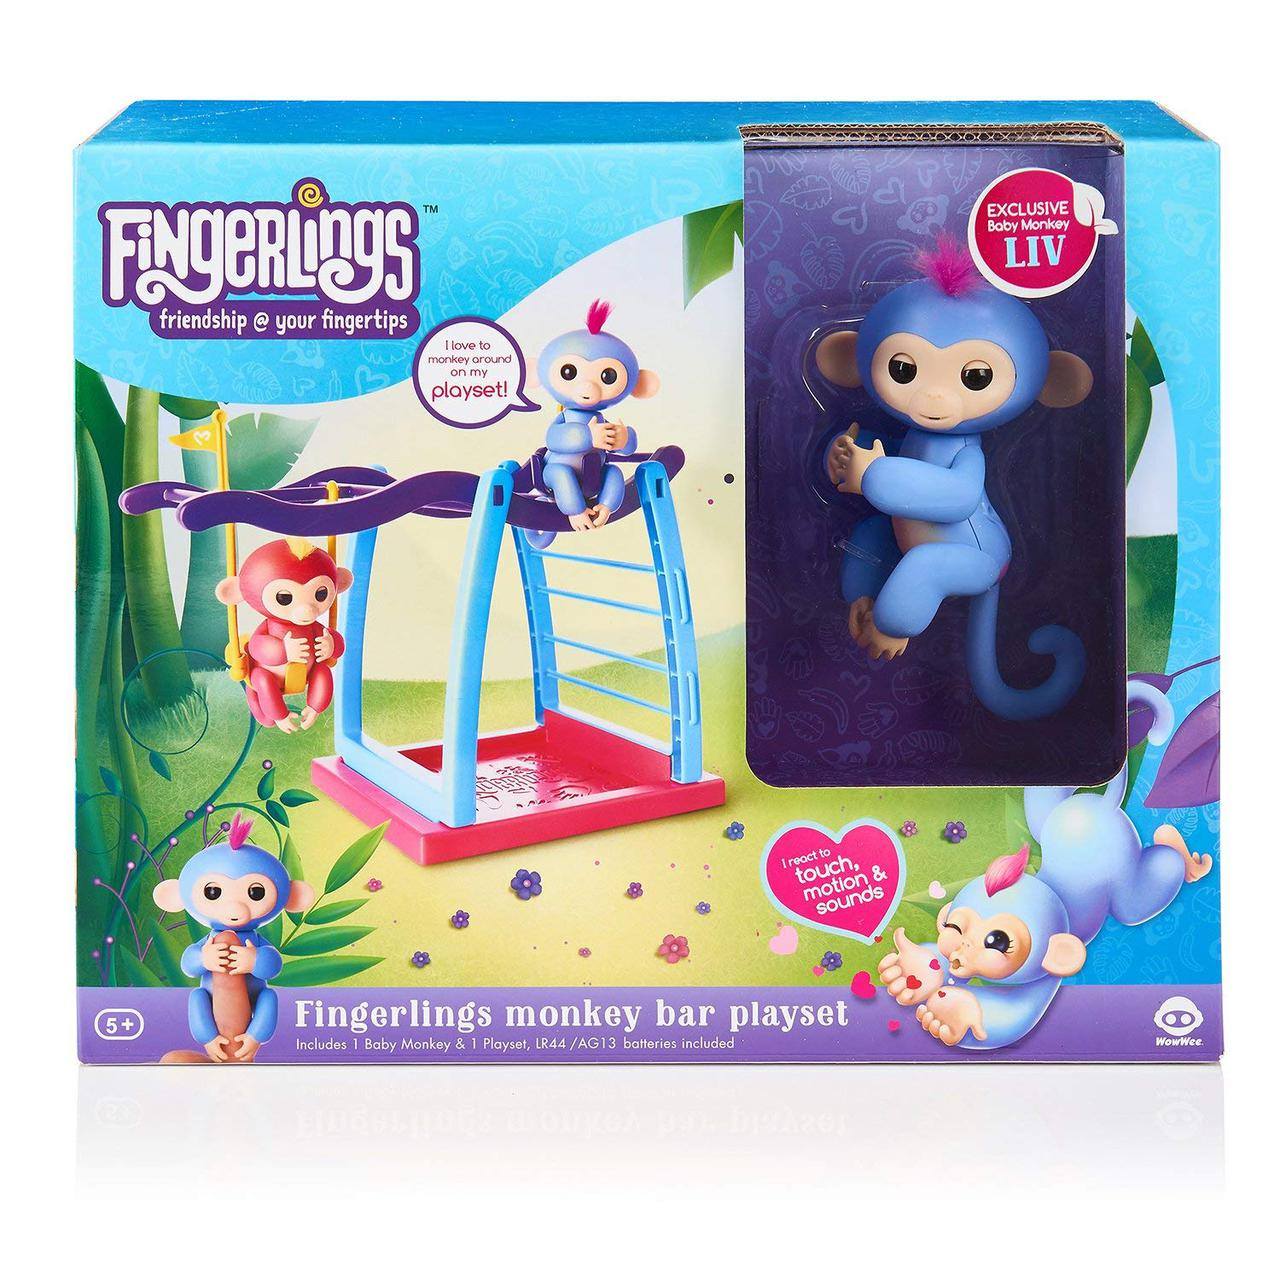 Интерактивная обезьянка с детской площадкой WowWee Fingerlings / Playset Bar Playground Liv The Baby Monkey